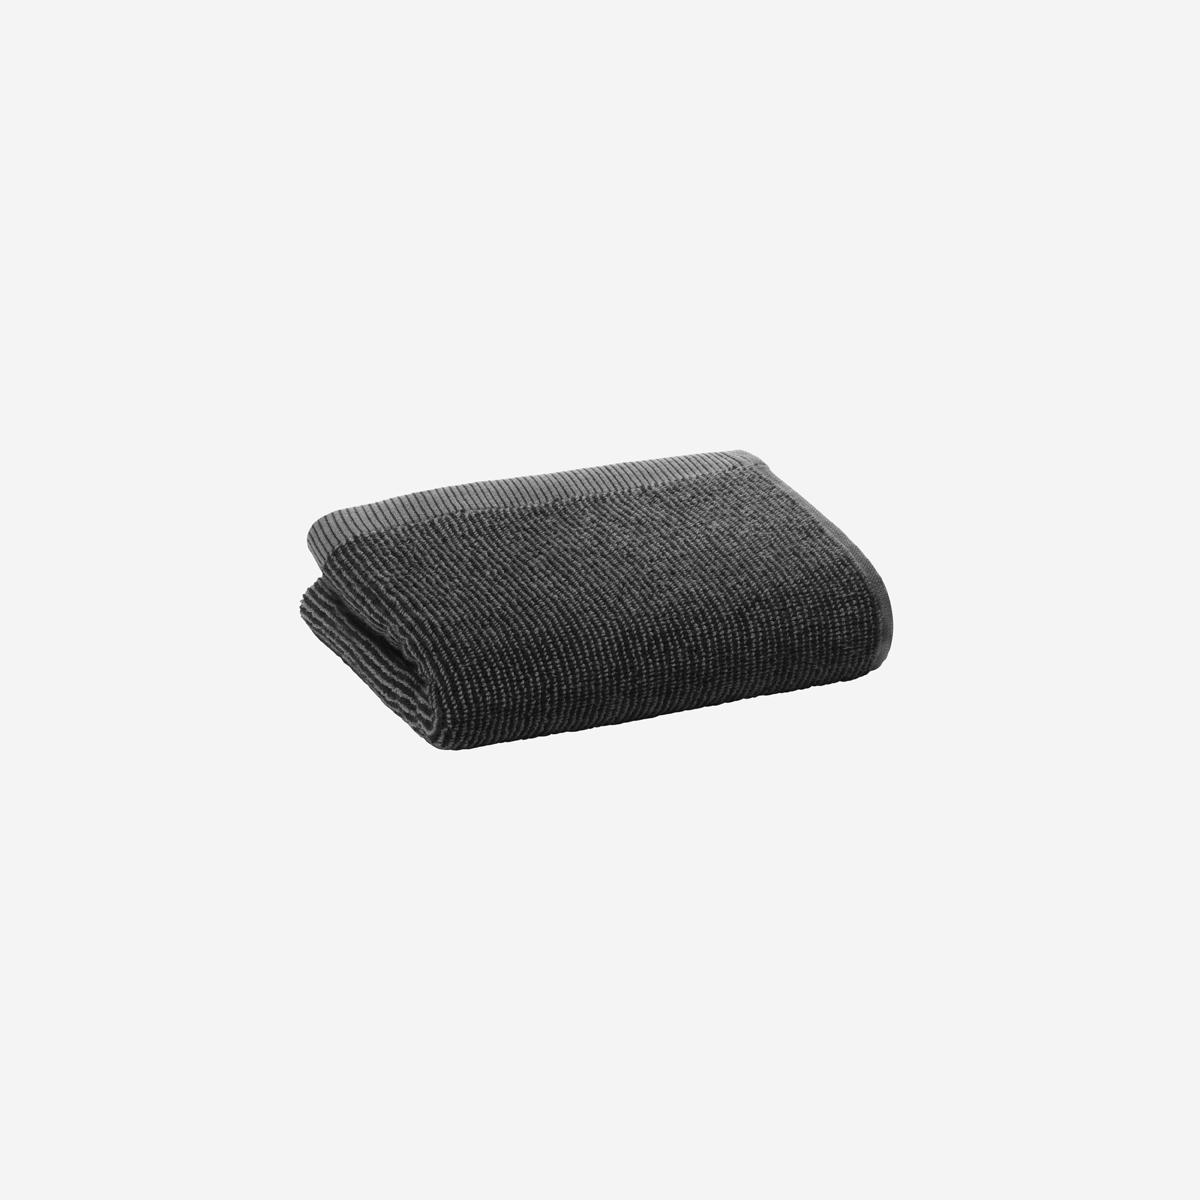 VIPP102 - Gjestehåndkle svart